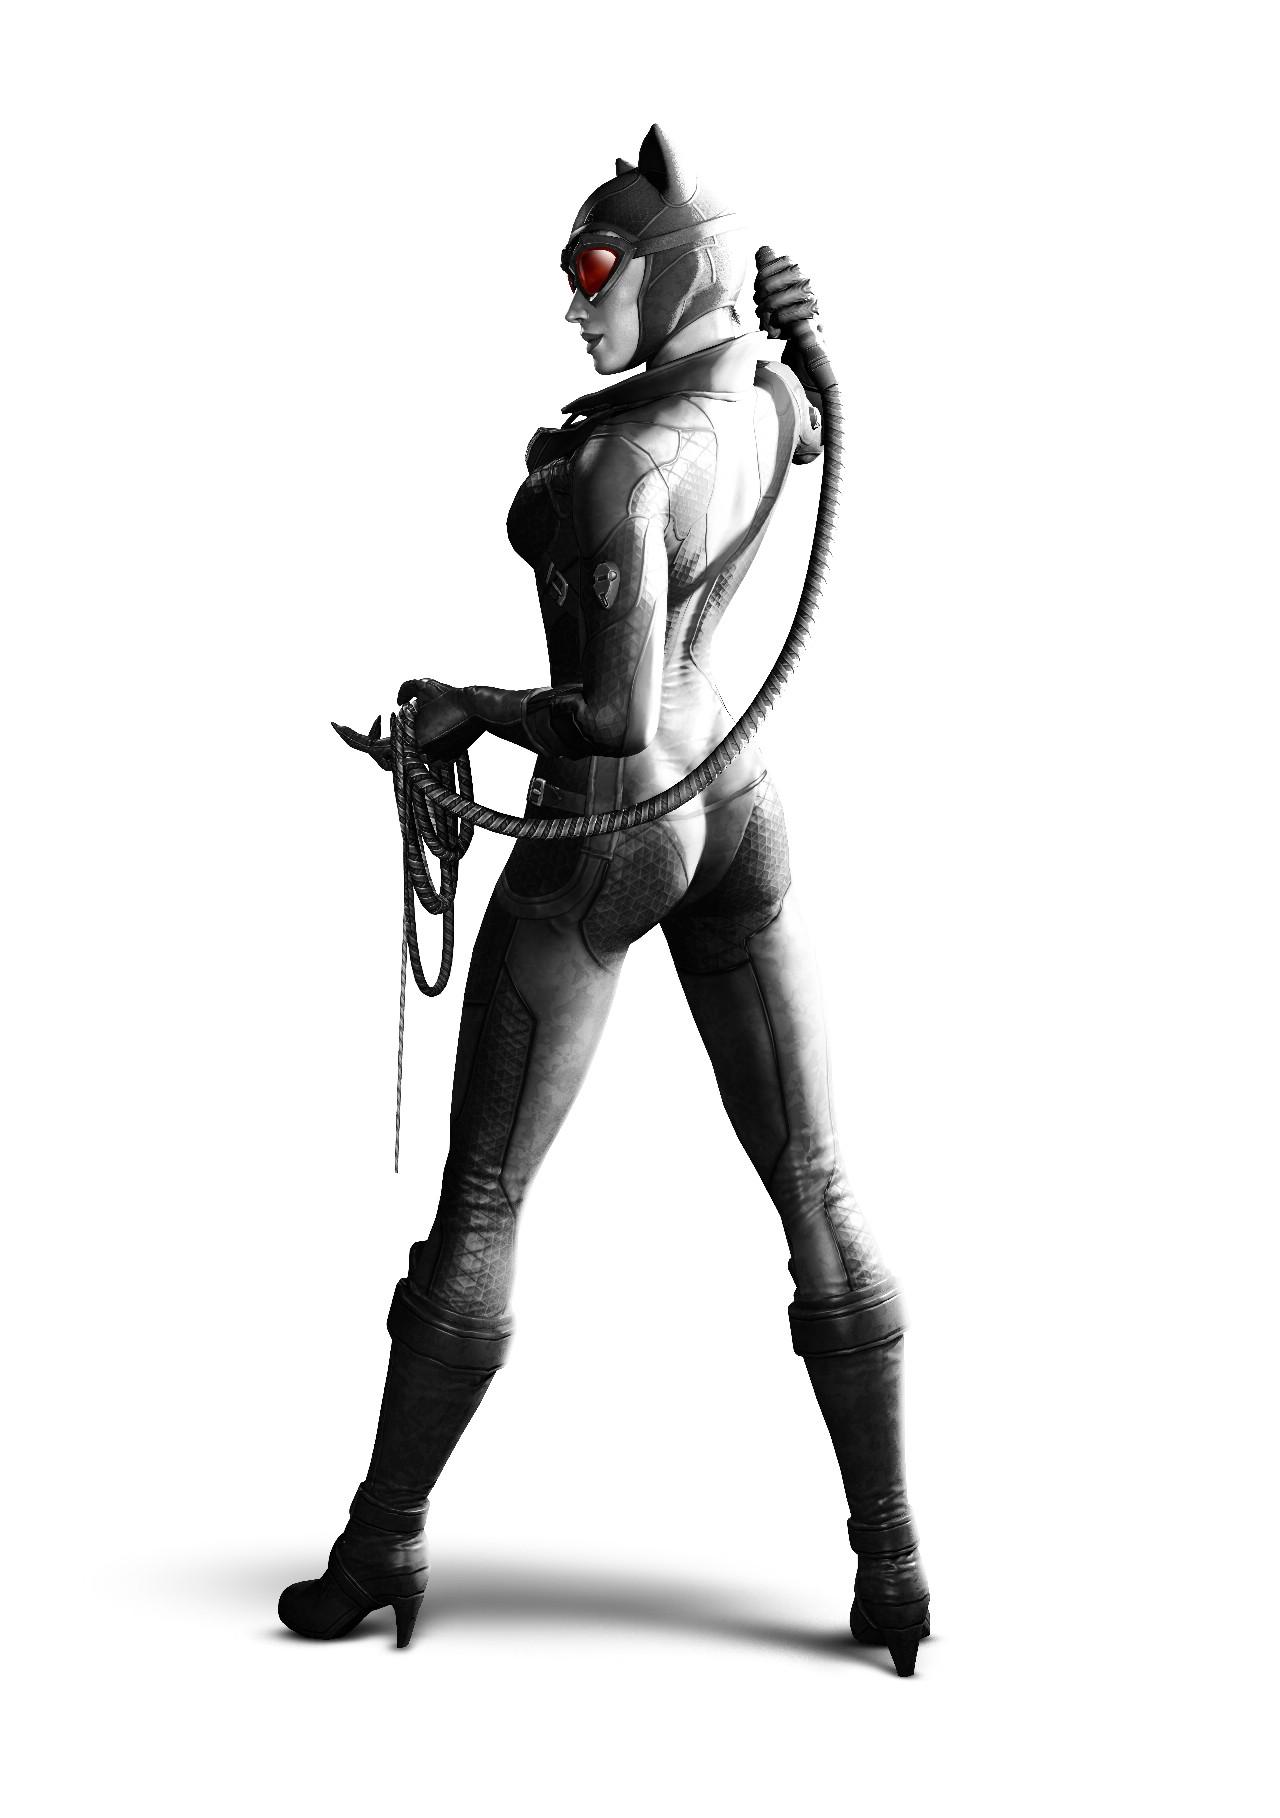 Arkham-city-catwoman.jpg  sc 1 st  Villains Wiki - Fandom & Image - Arkham-city-catwoman.jpg | Villains Wiki | FANDOM powered by ...